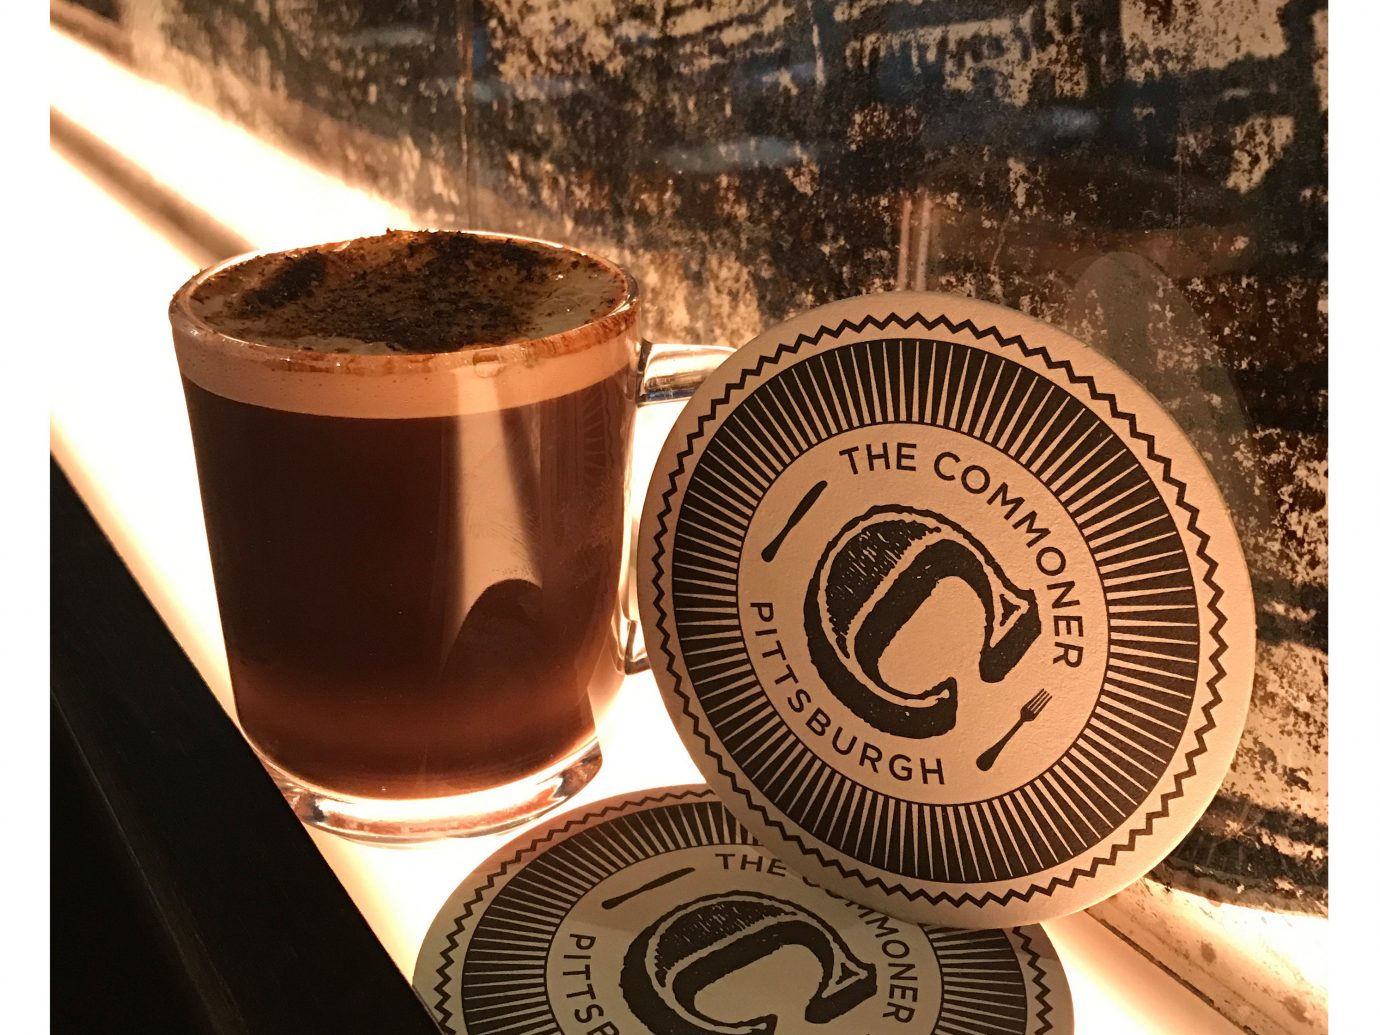 Food + Drink cup Drink coffee coffee cup caffeine chocolate brand espresso flavor